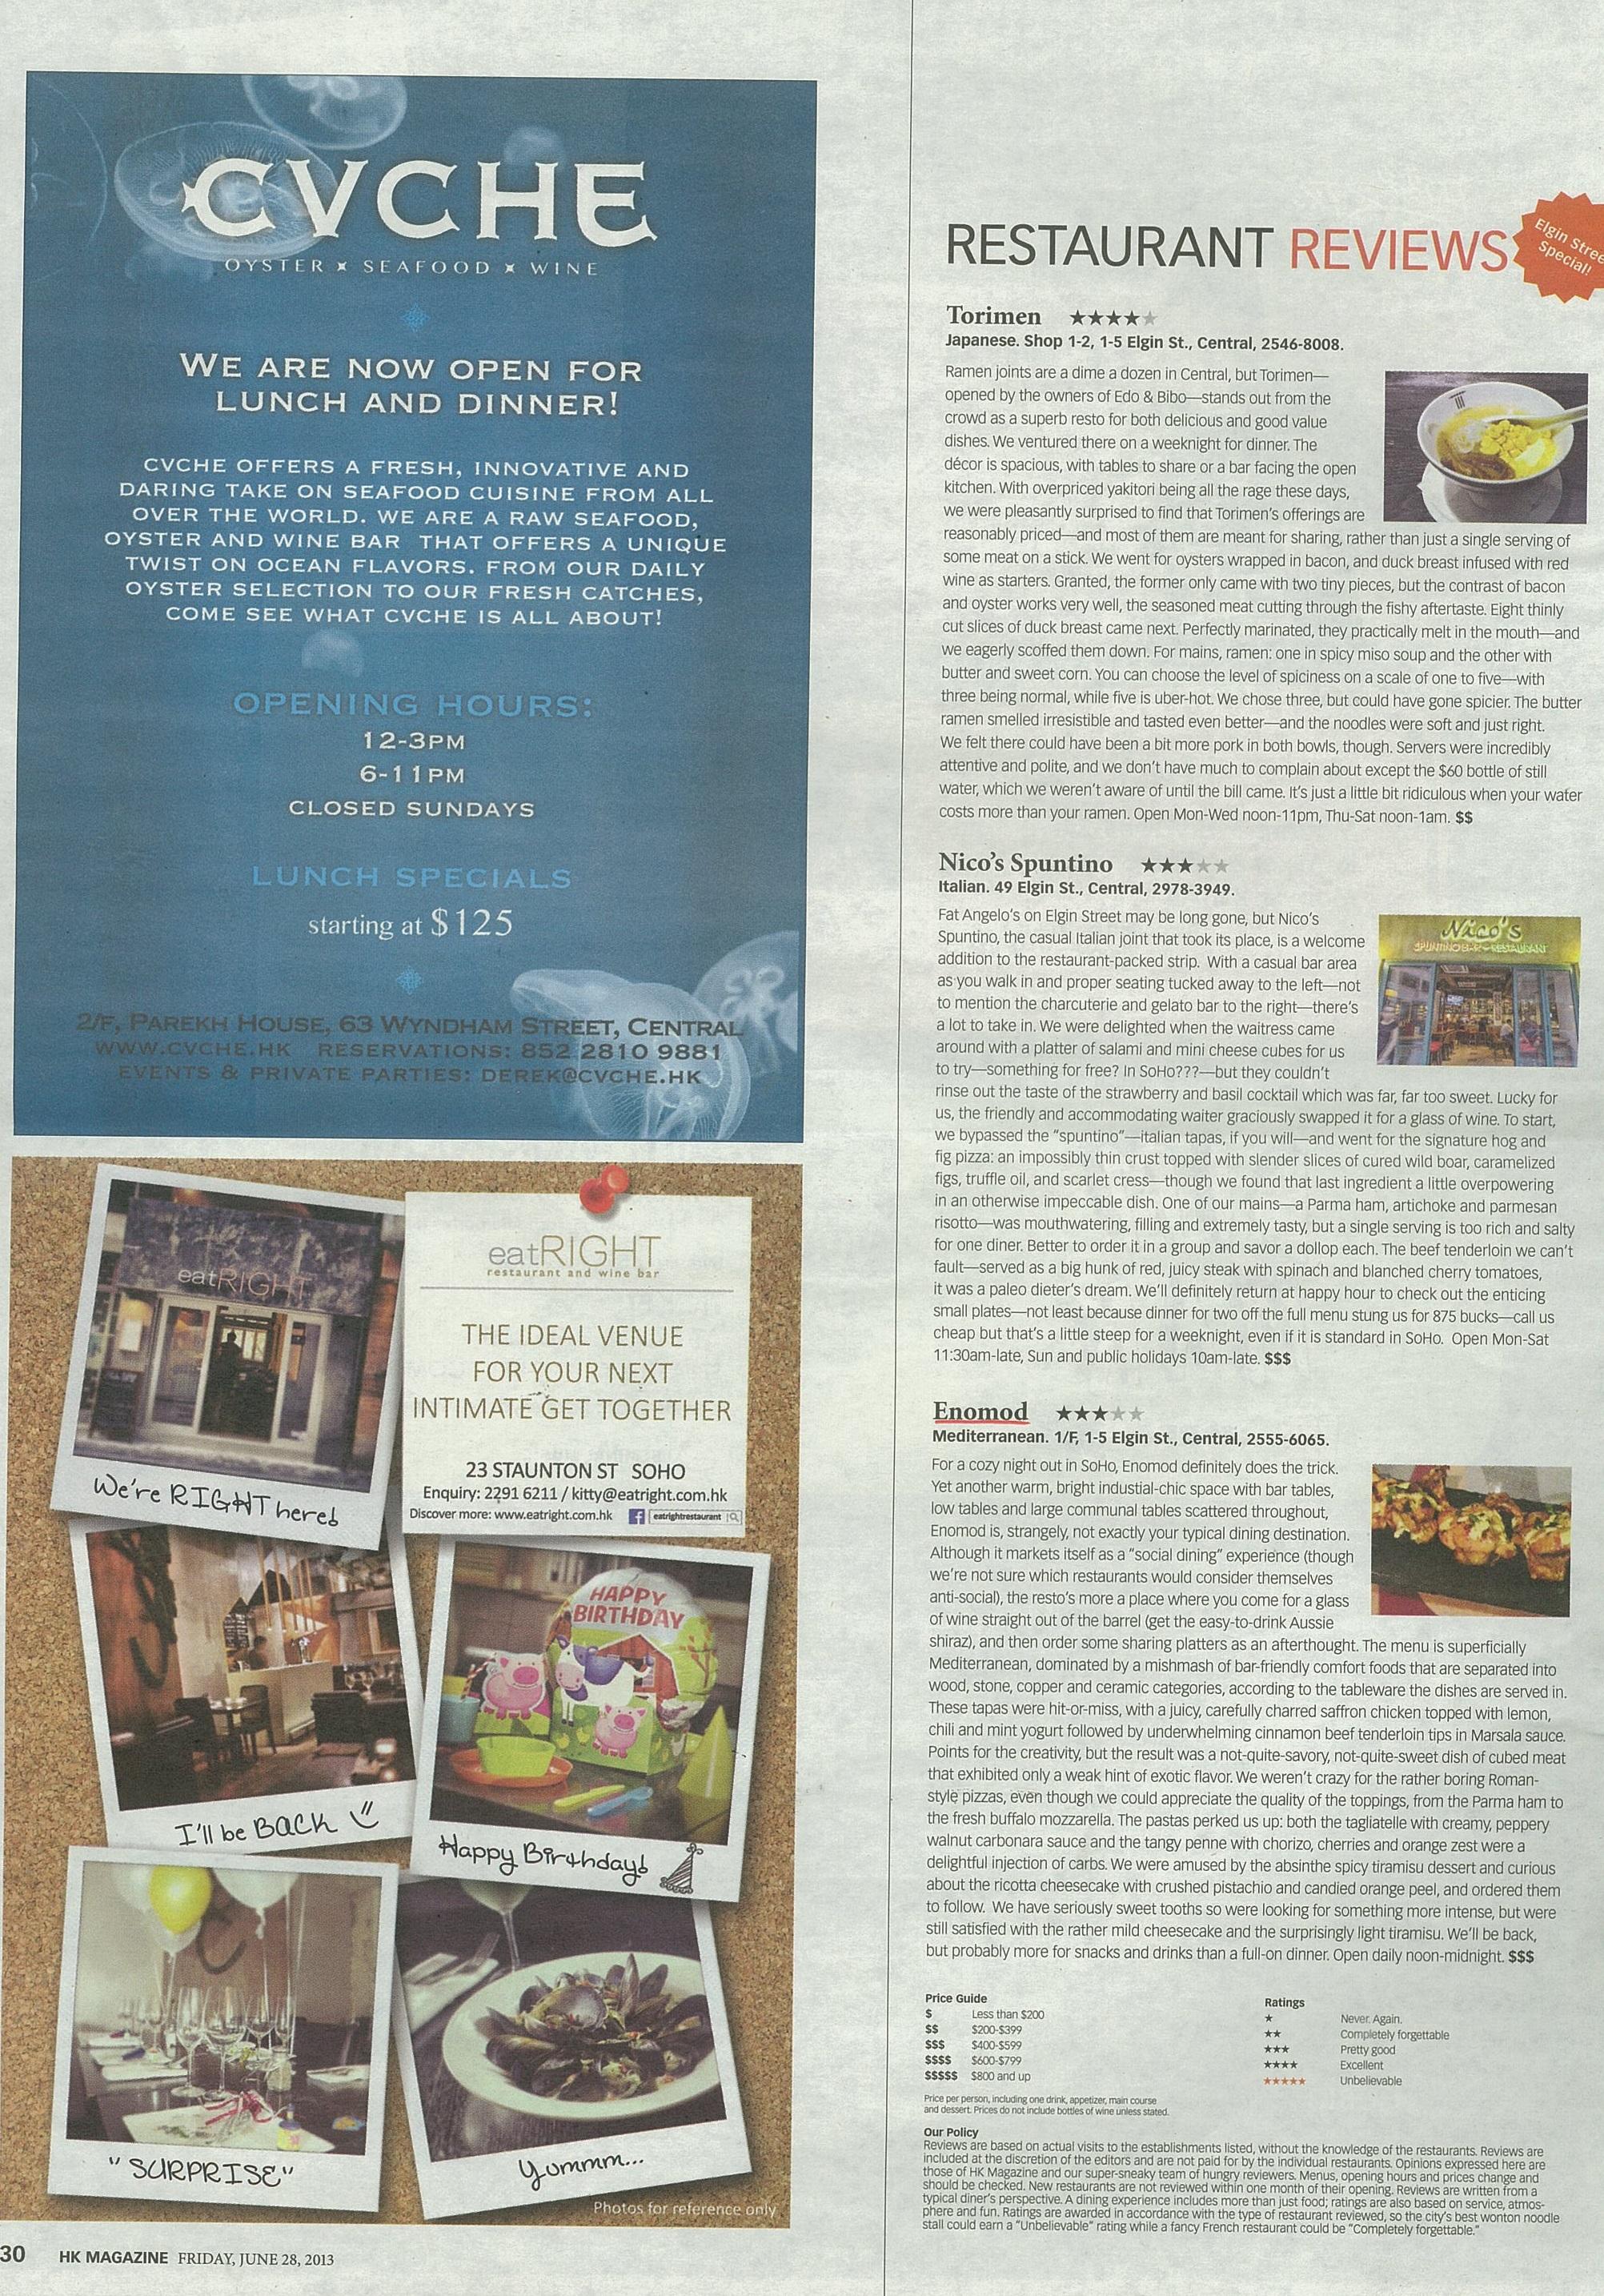 ENOMOD - 02.07 - Hong Kong Magazine-Jul- (P30).jpg